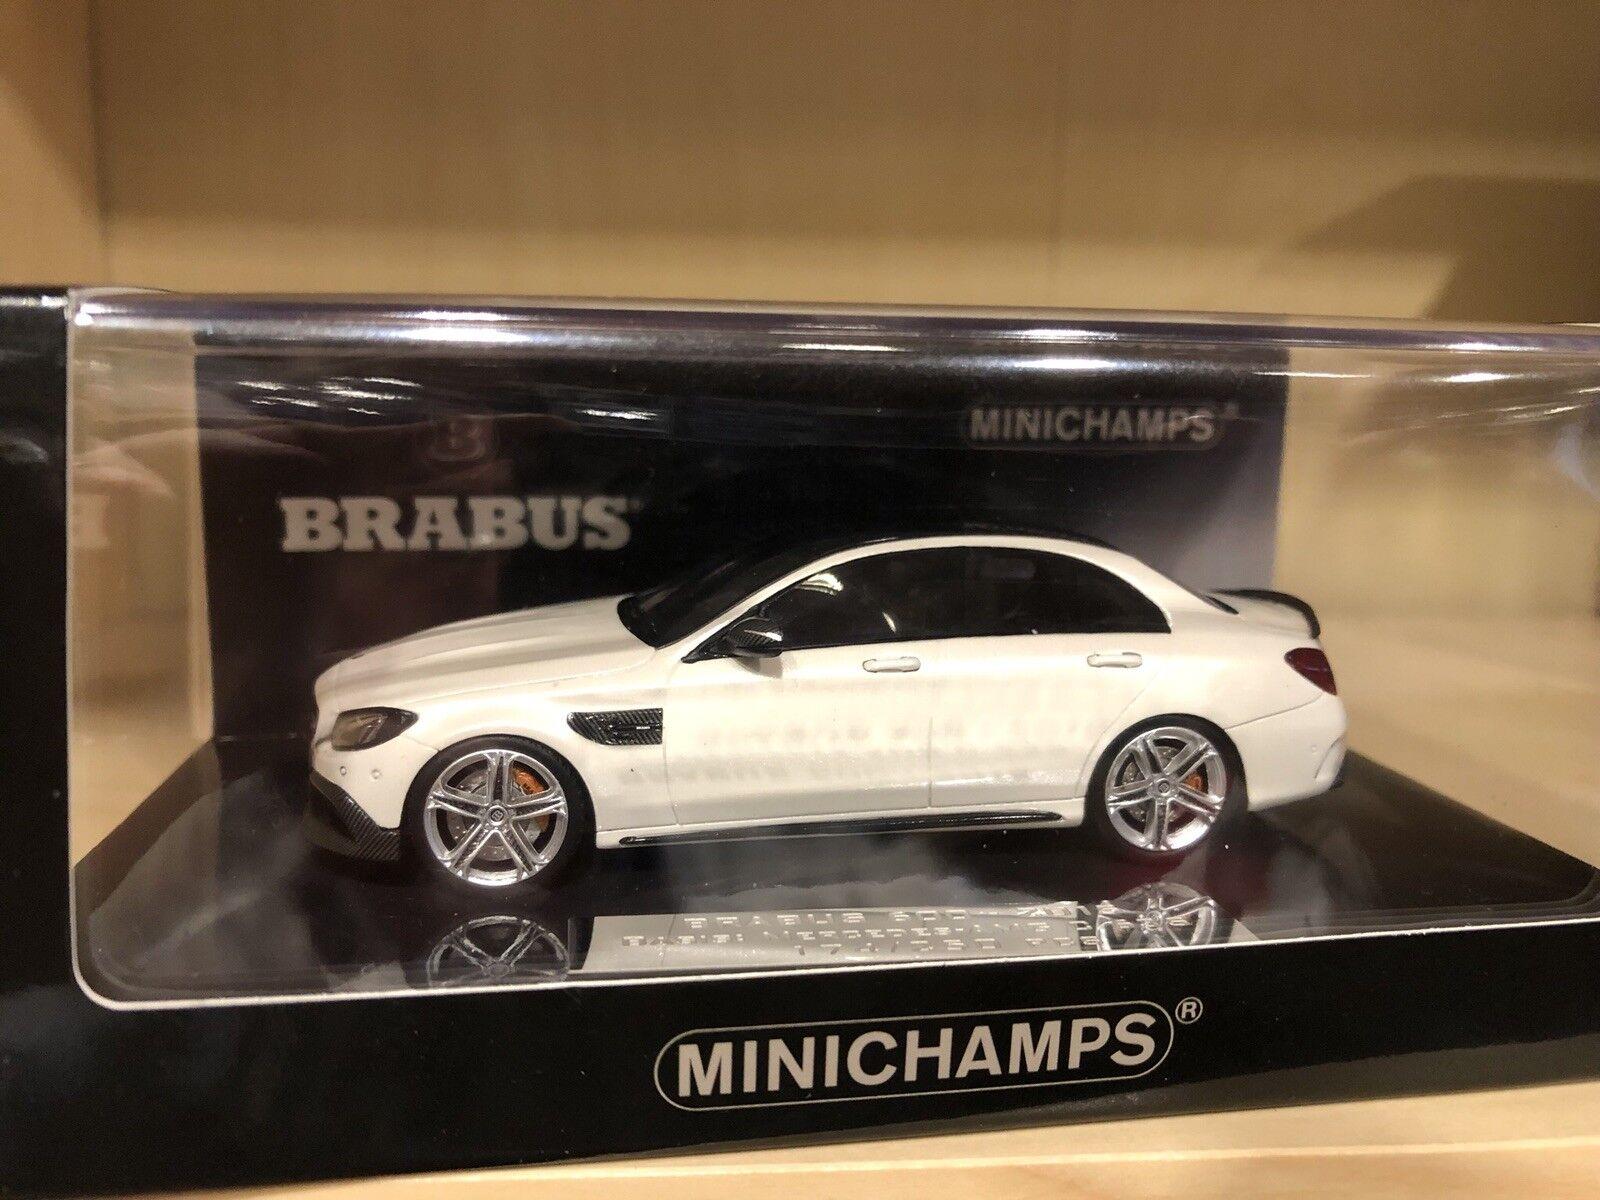 Mercedes-benz Brabus 600 AMG c63-Weiss-Minichamps - 1 43